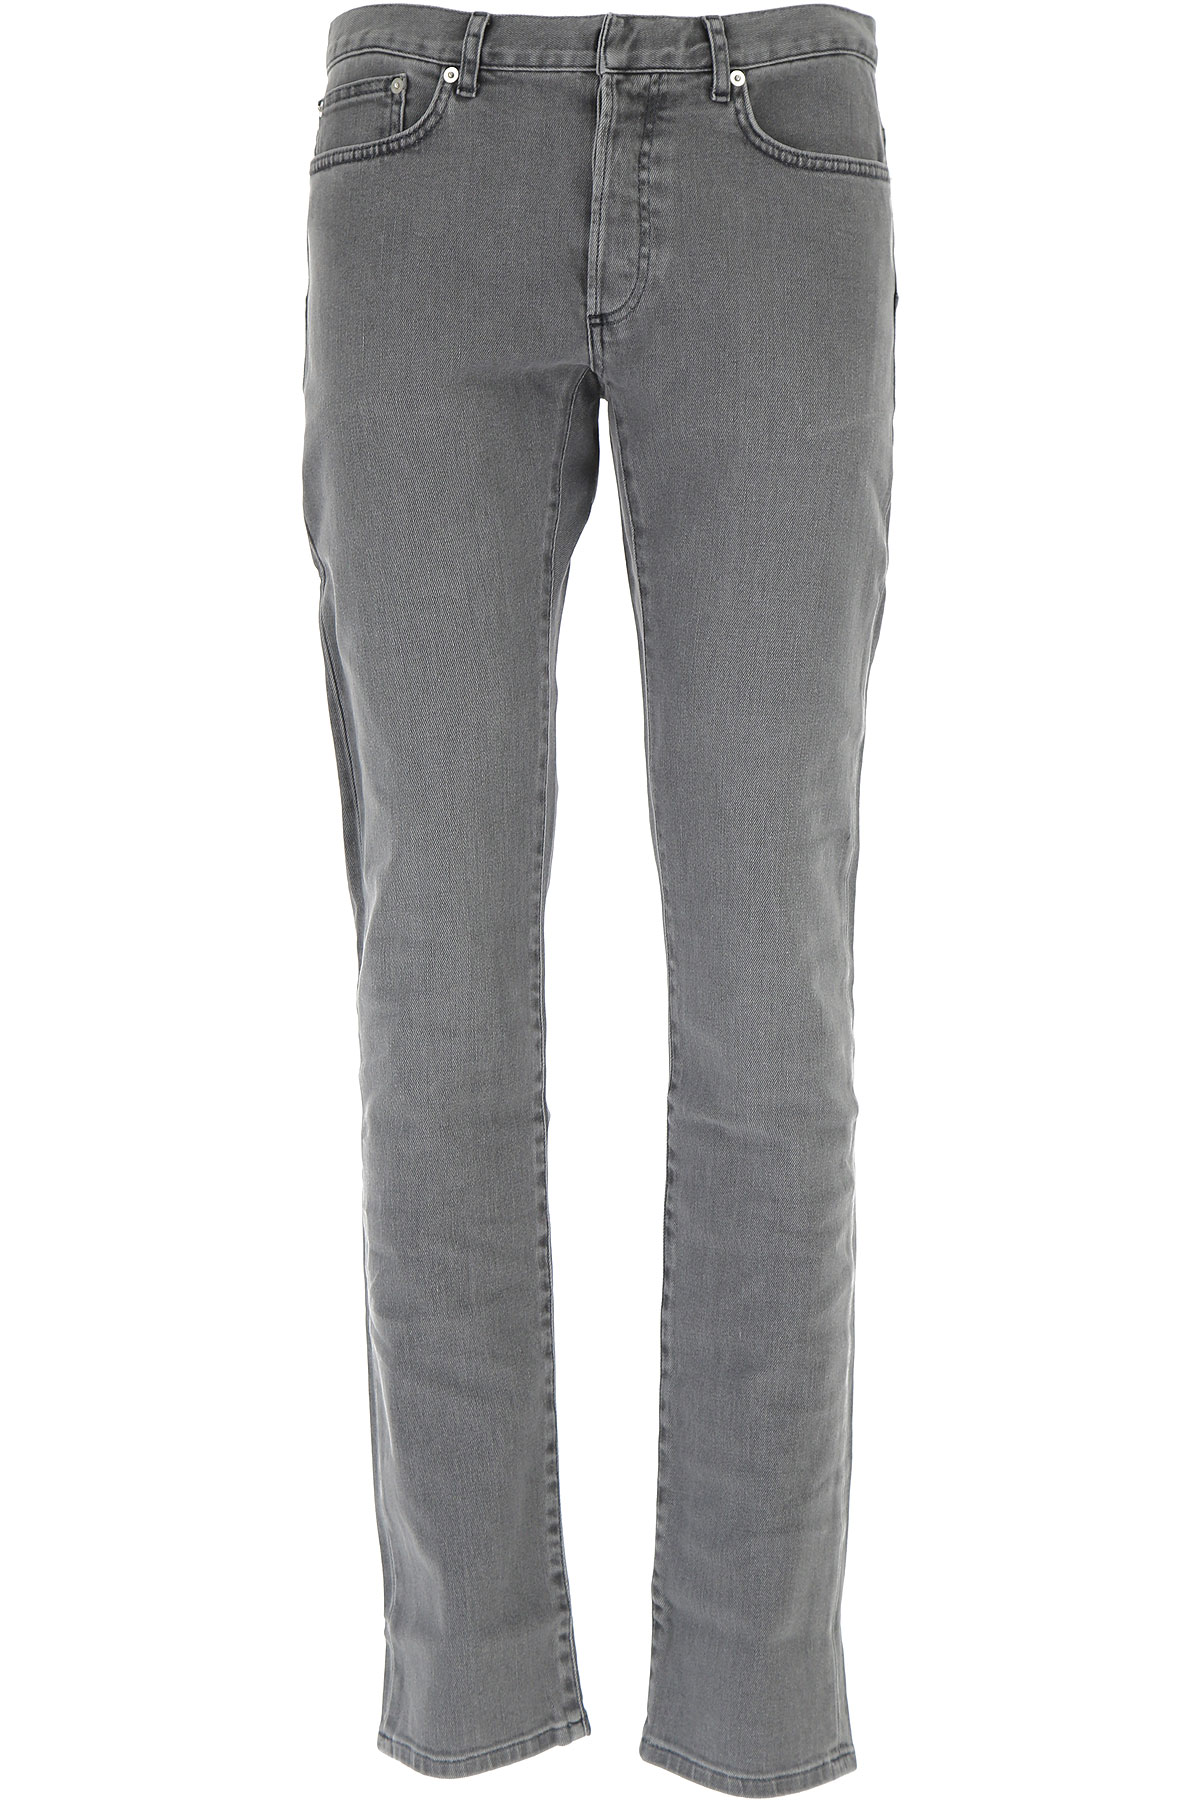 Christian Dior Jeans On Sale, Grey, Cotton, 2017, 30 31 33 USA-449158